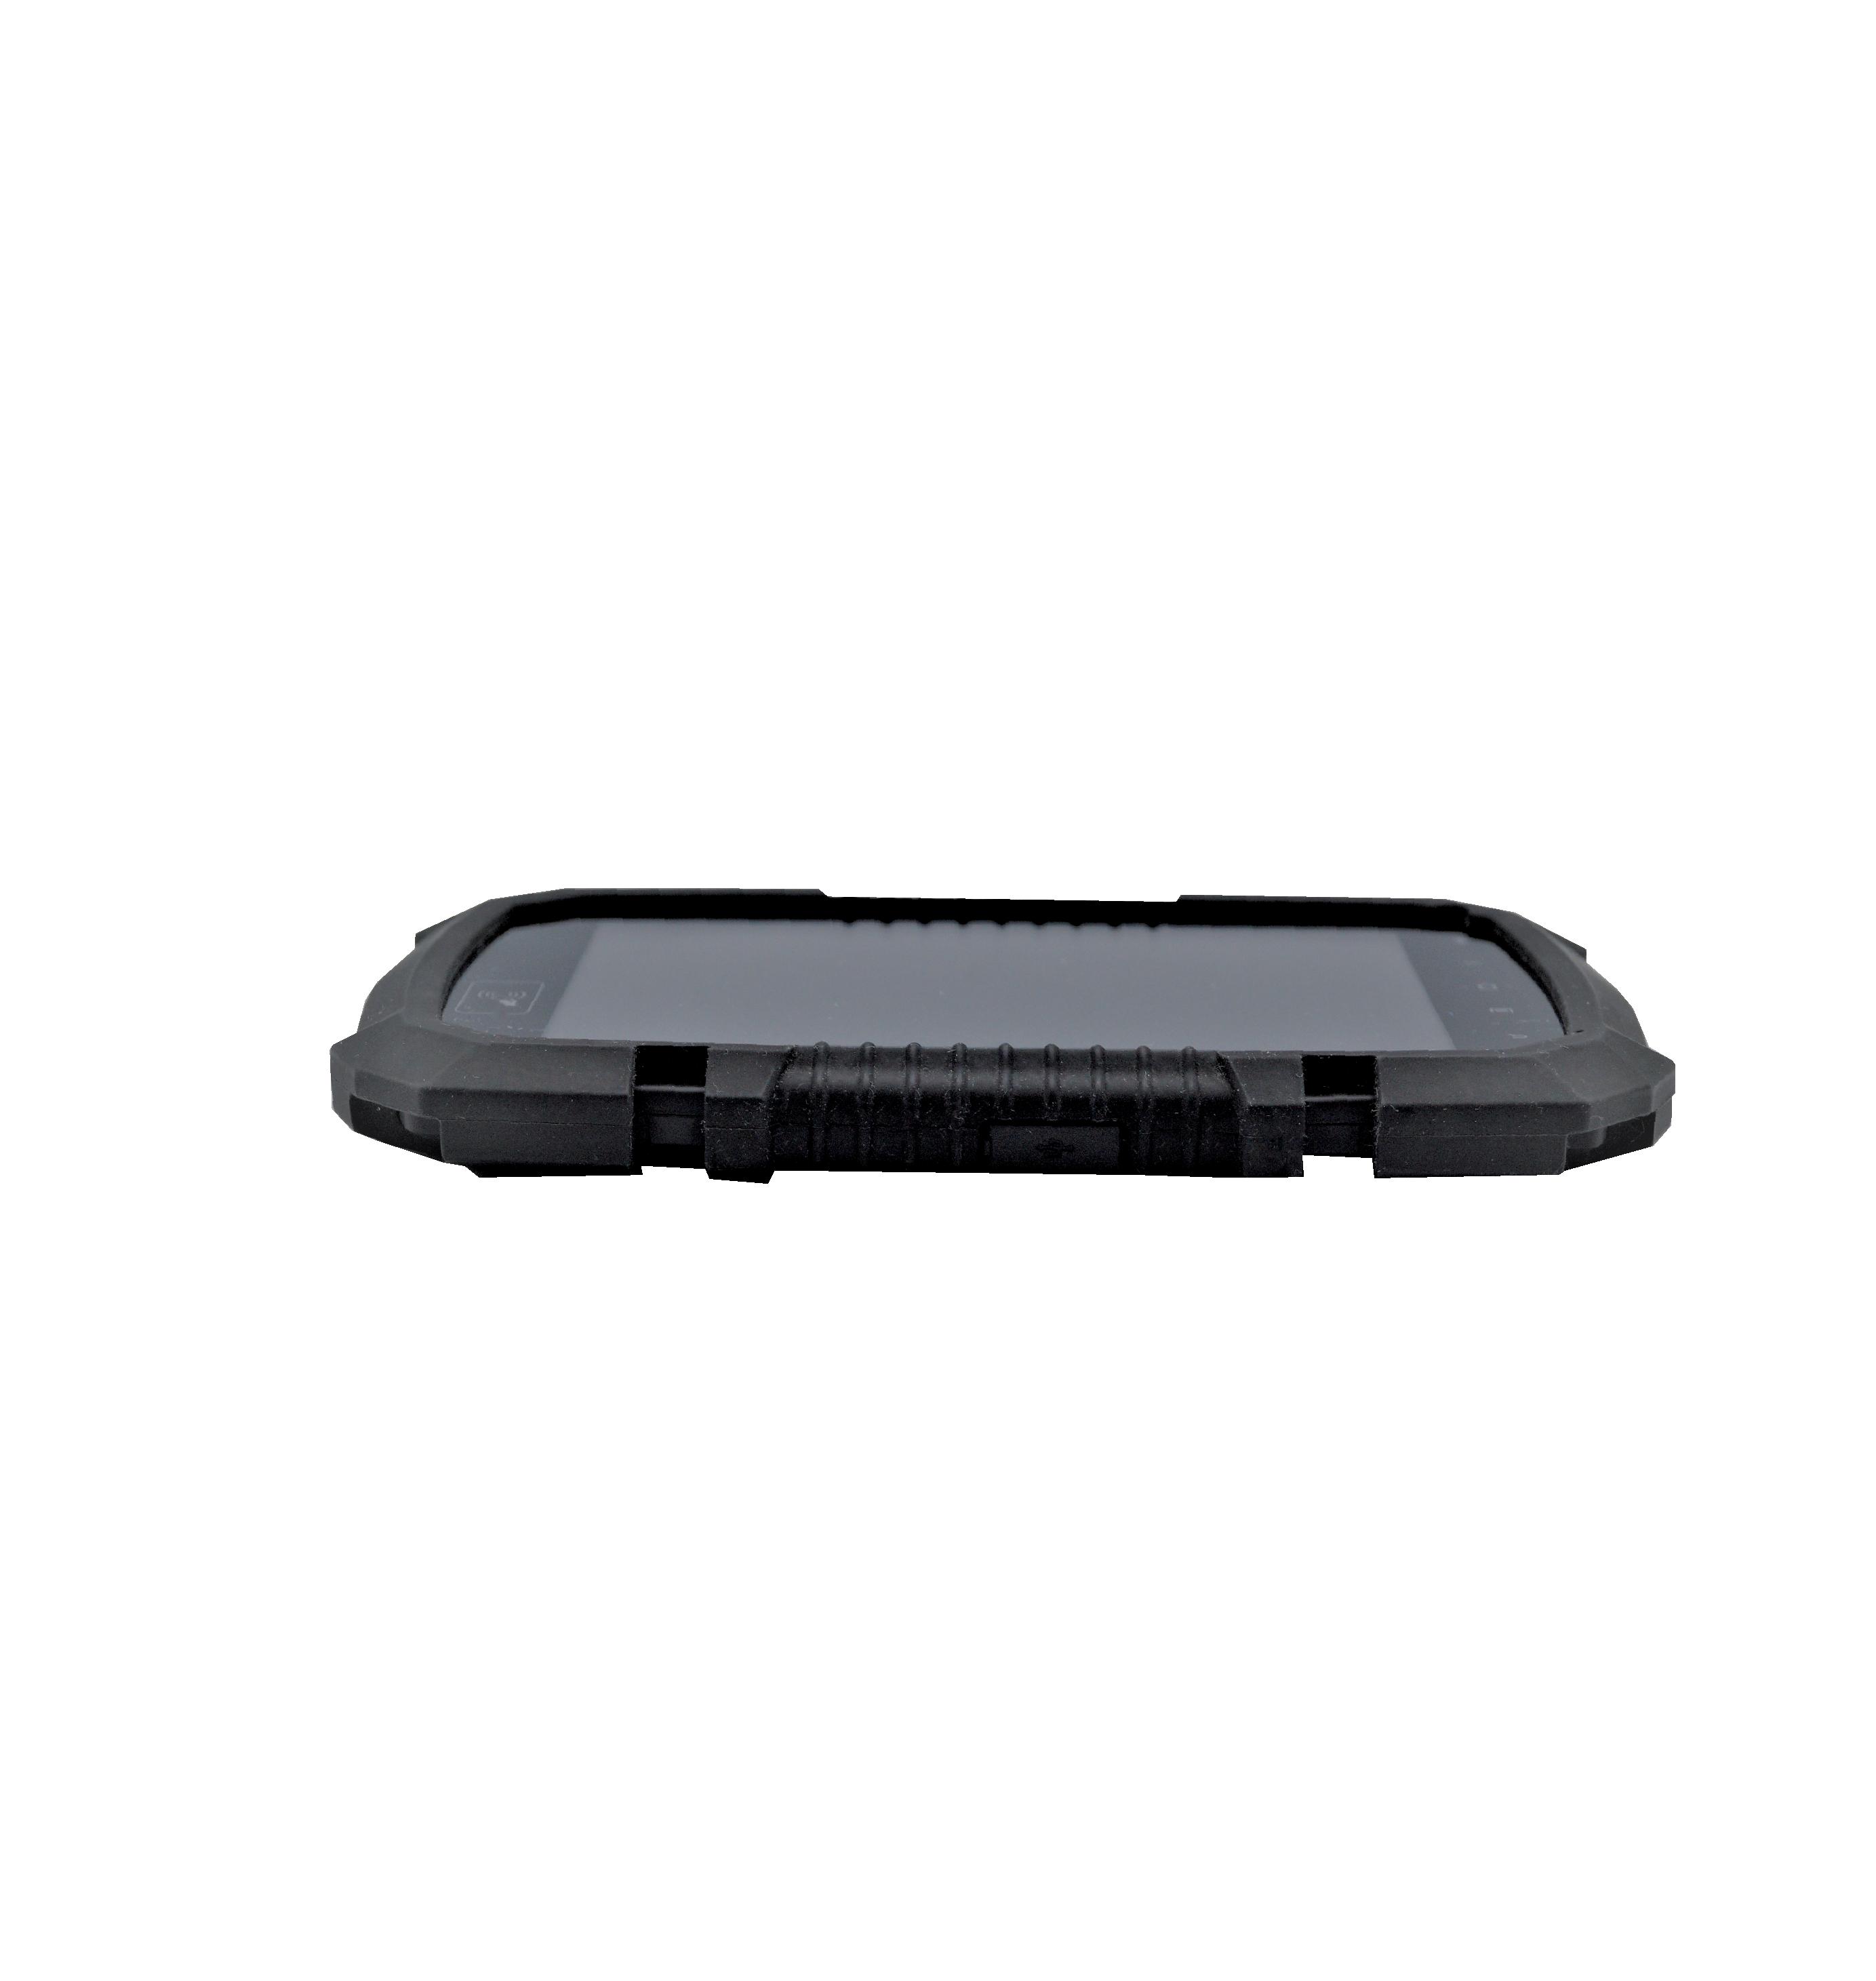 Guardian Elog Device view 1